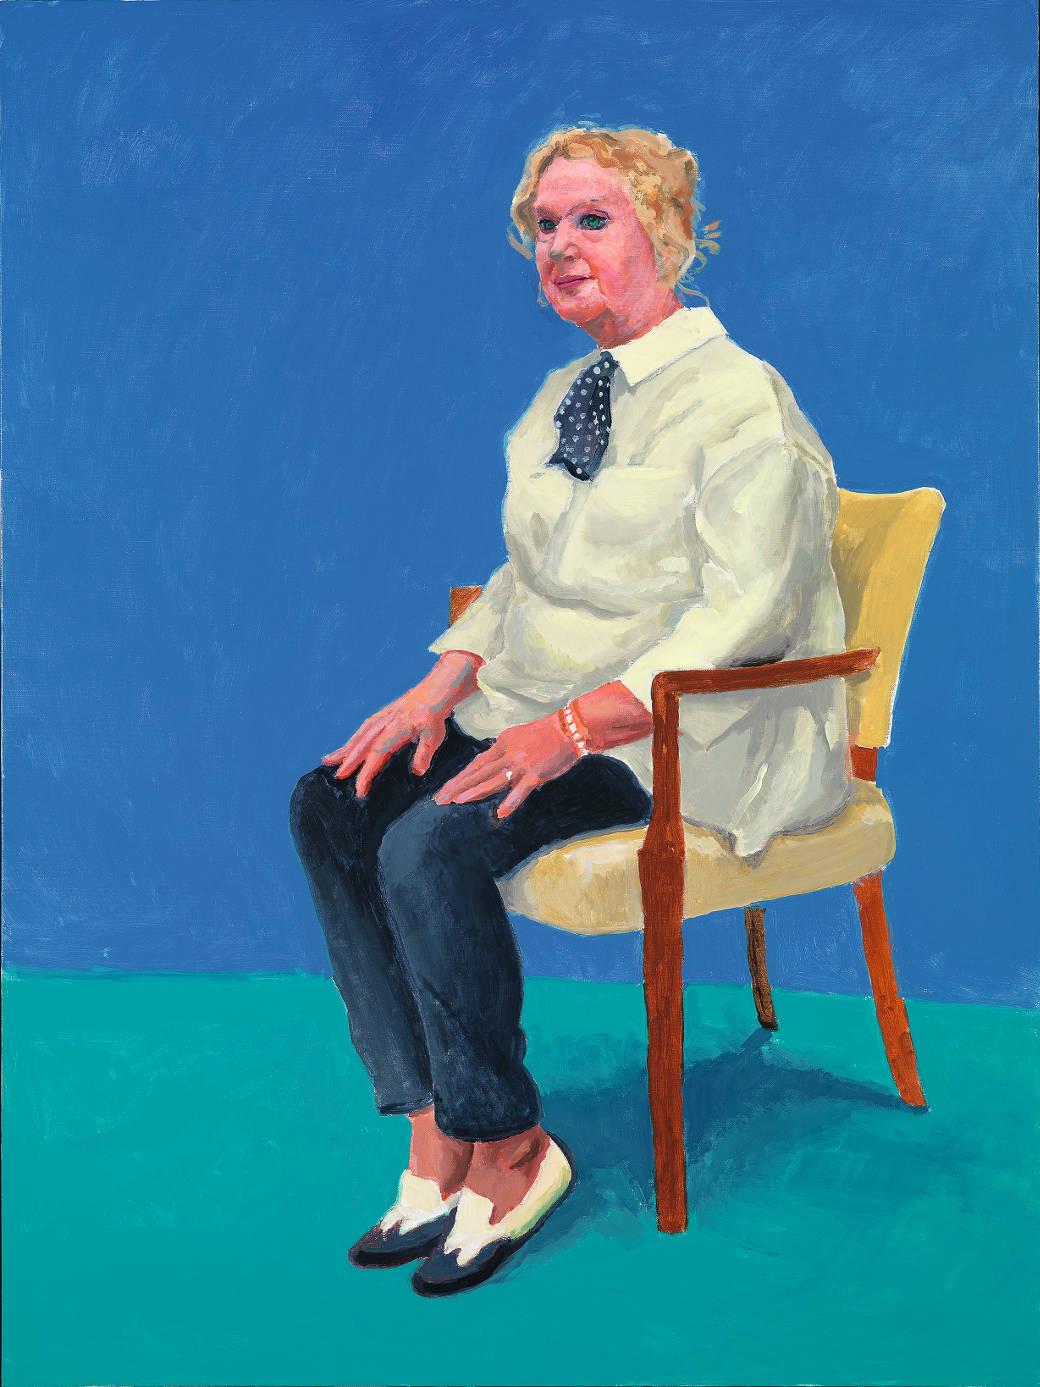 David Hockney, 'Celia Birtwell'(©David Hockney, foto Richard Schmidt)